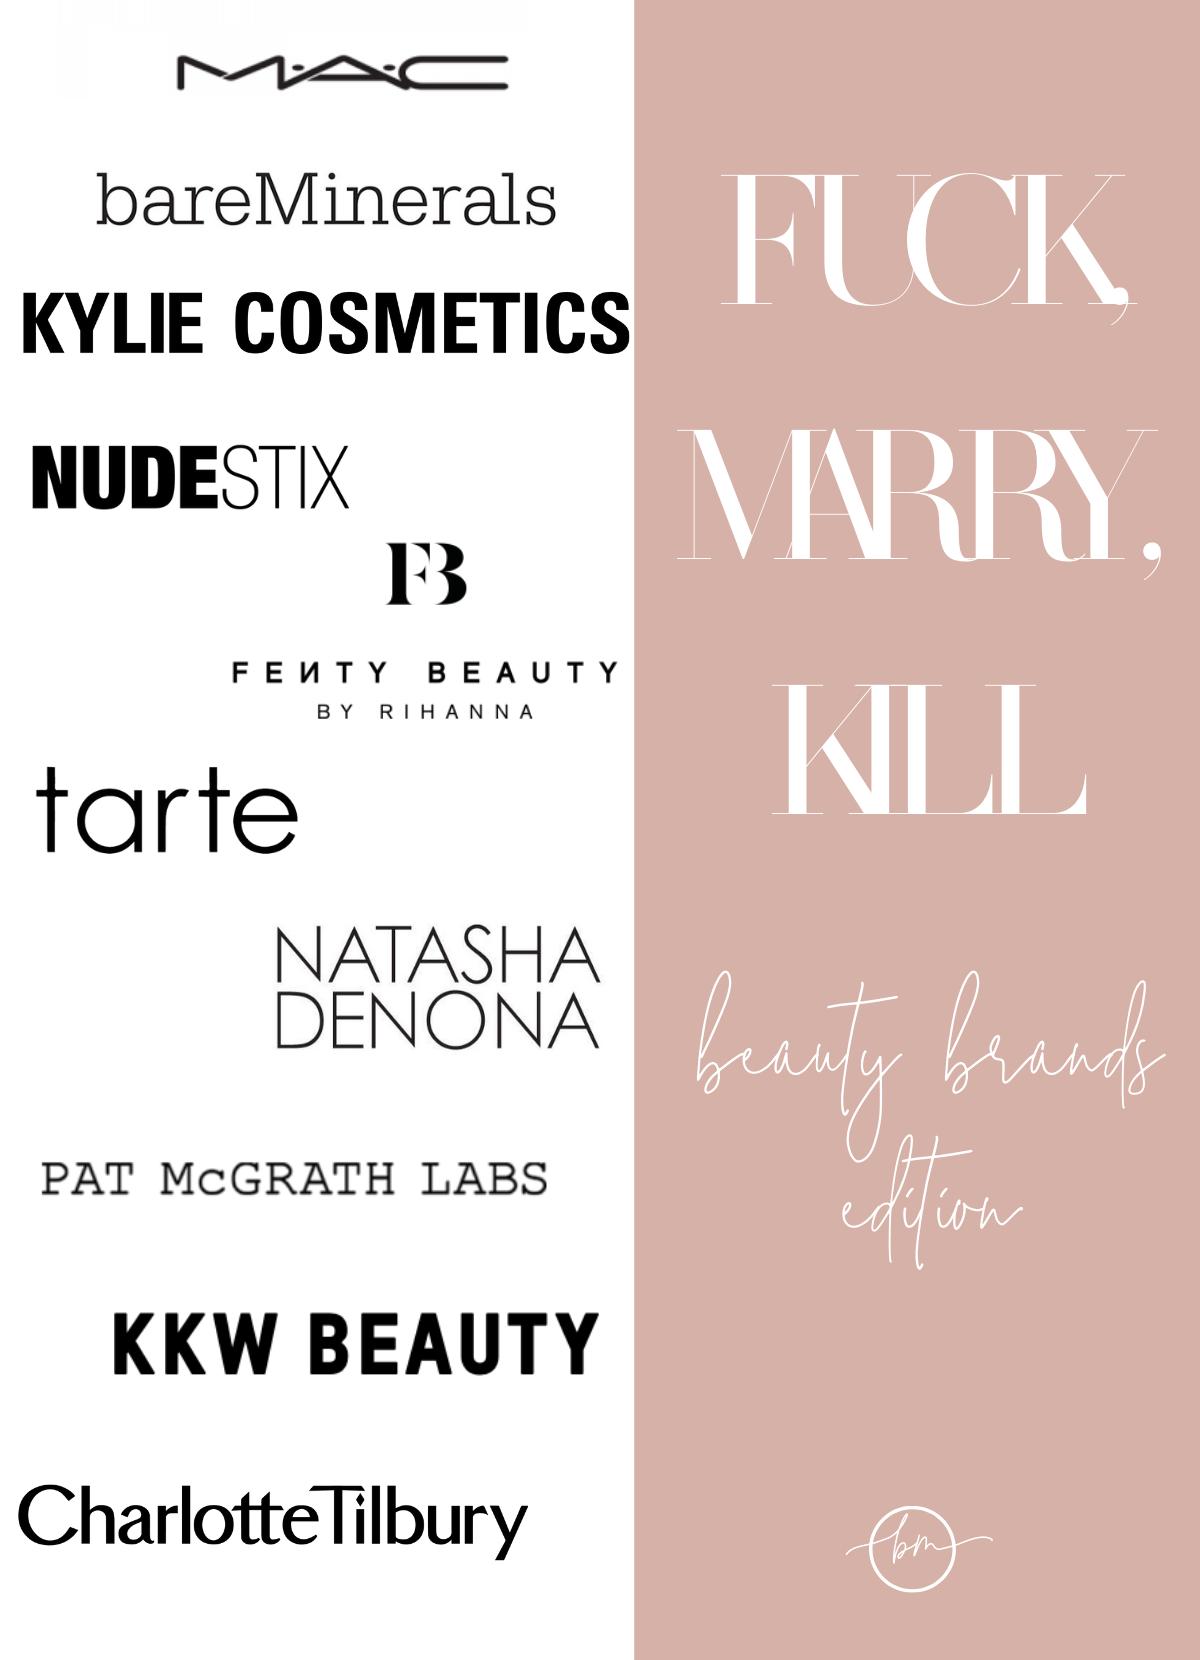 Fuck, Marry, Kill: Rating 10 Beauty Brands Edition